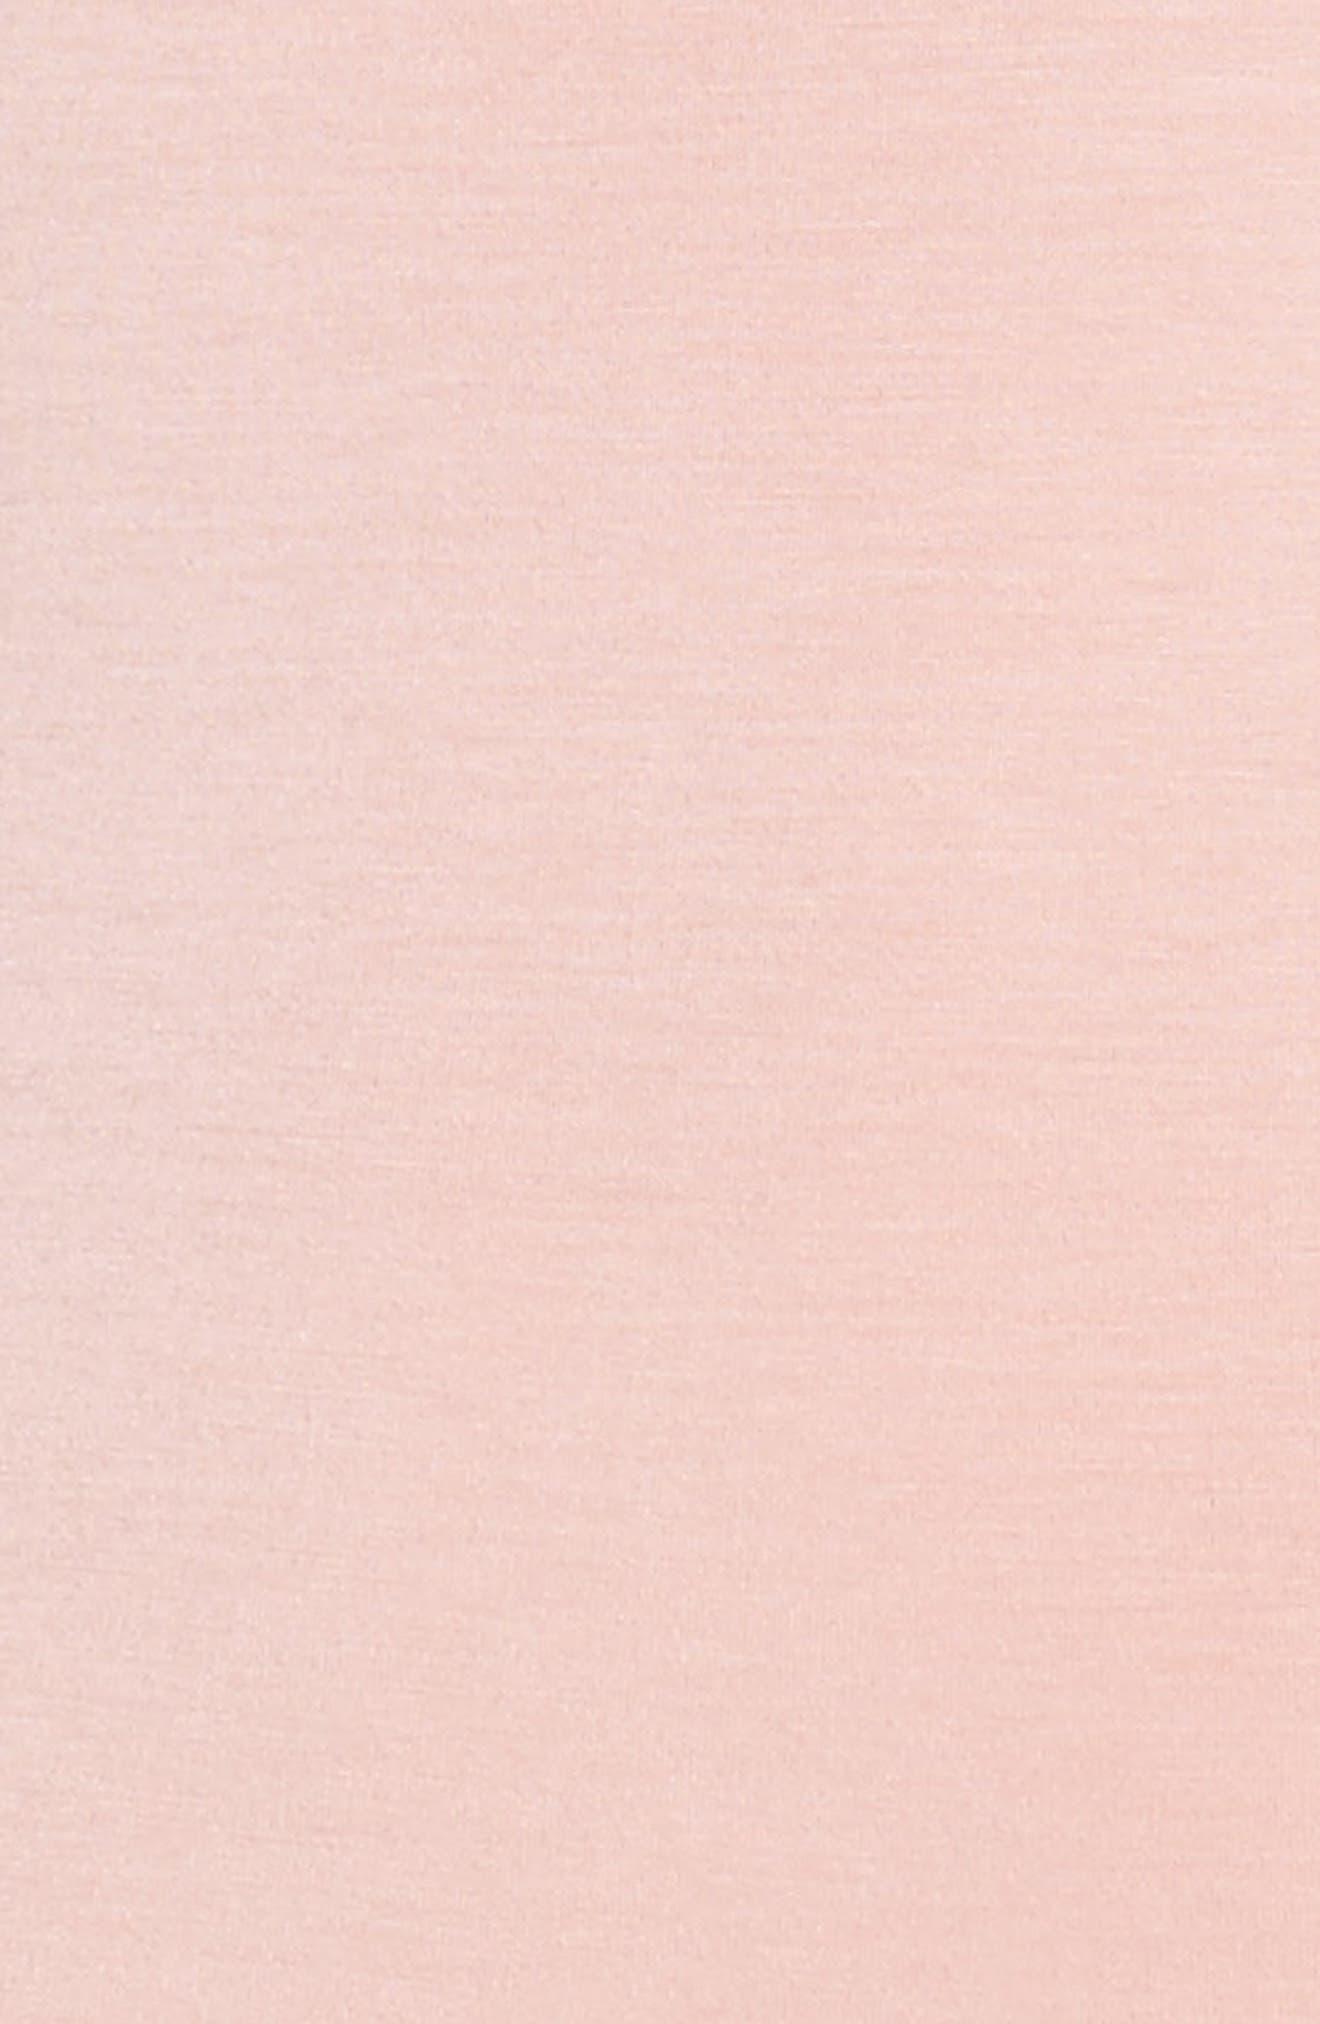 Jenny V-Neck Thong Bodysuit,                             Alternate thumbnail 4, color,                             Dream Pink